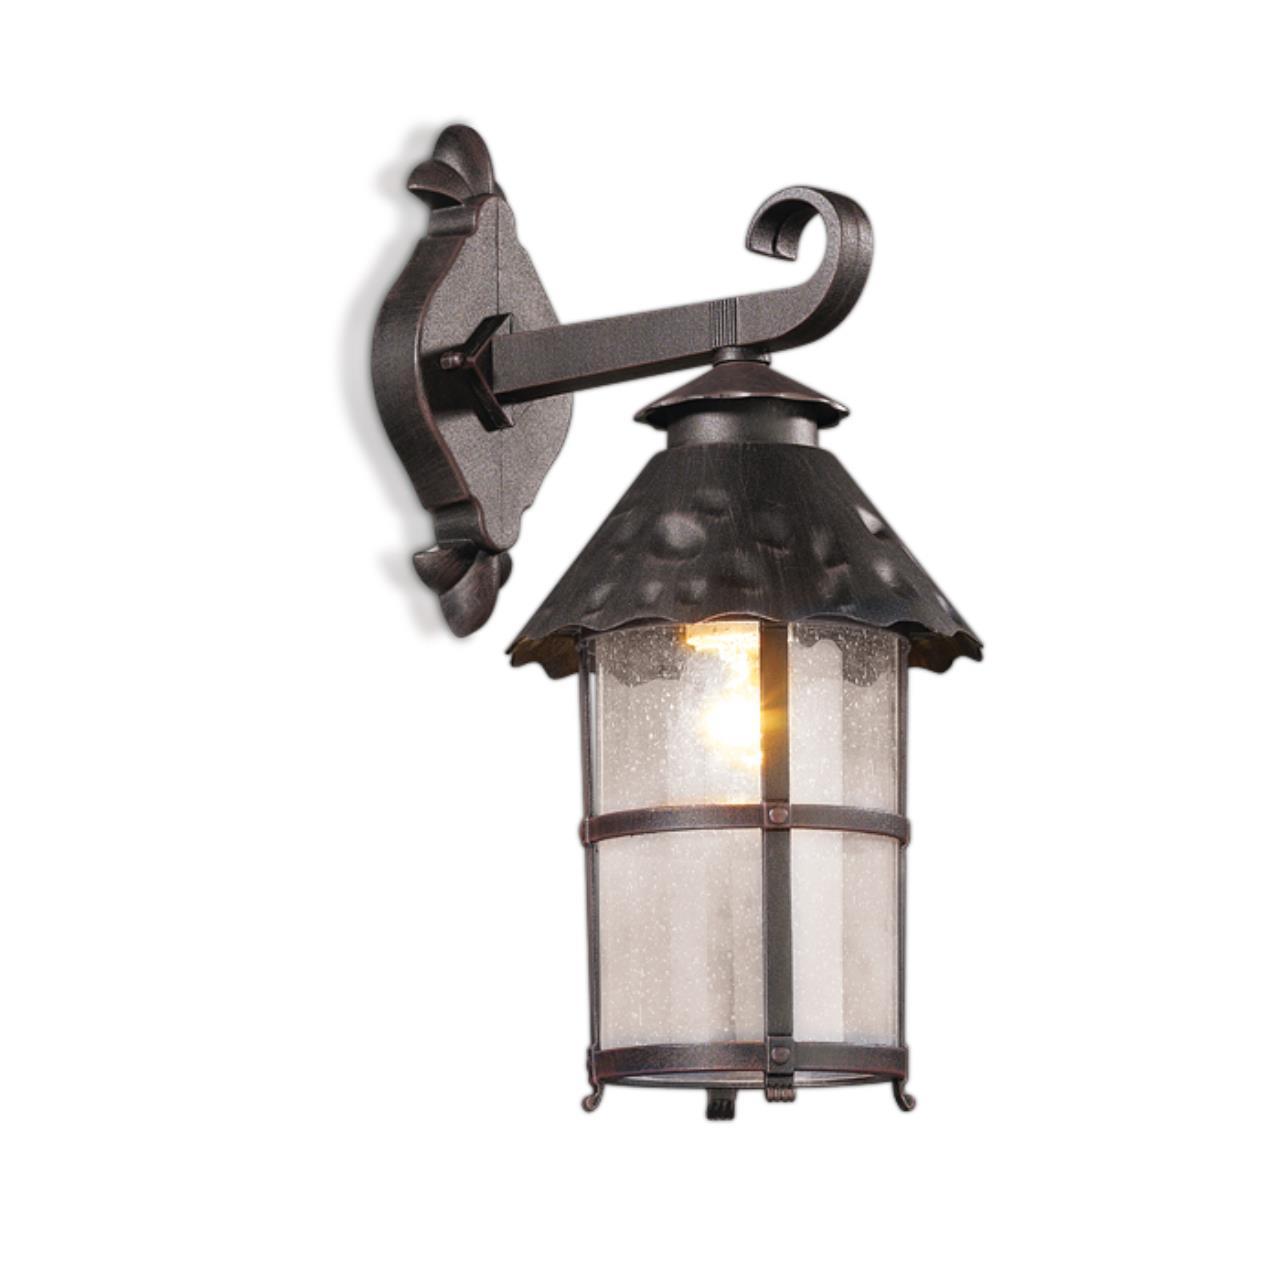 2313/1W NATURE ODL12 717 коричневый Уличный настен светильник IP44 E27 60W 220V LUMI